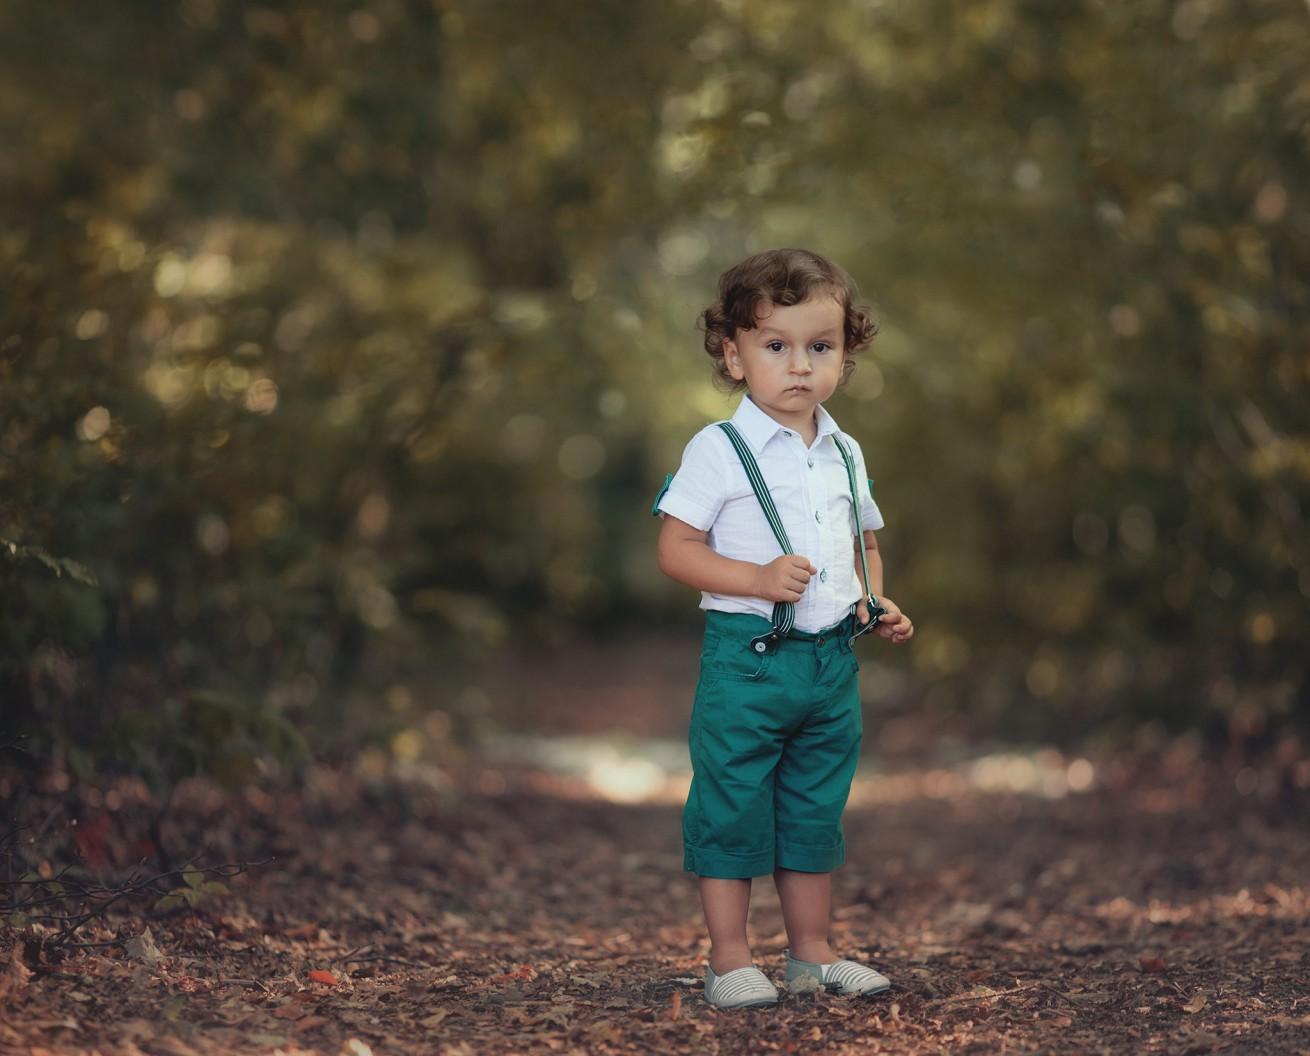 sedinta foto copii in natura brasov, fotograf copii brasov, fotograf profesionist brasov, fotograf familie si bebelusi daniel penciuc,